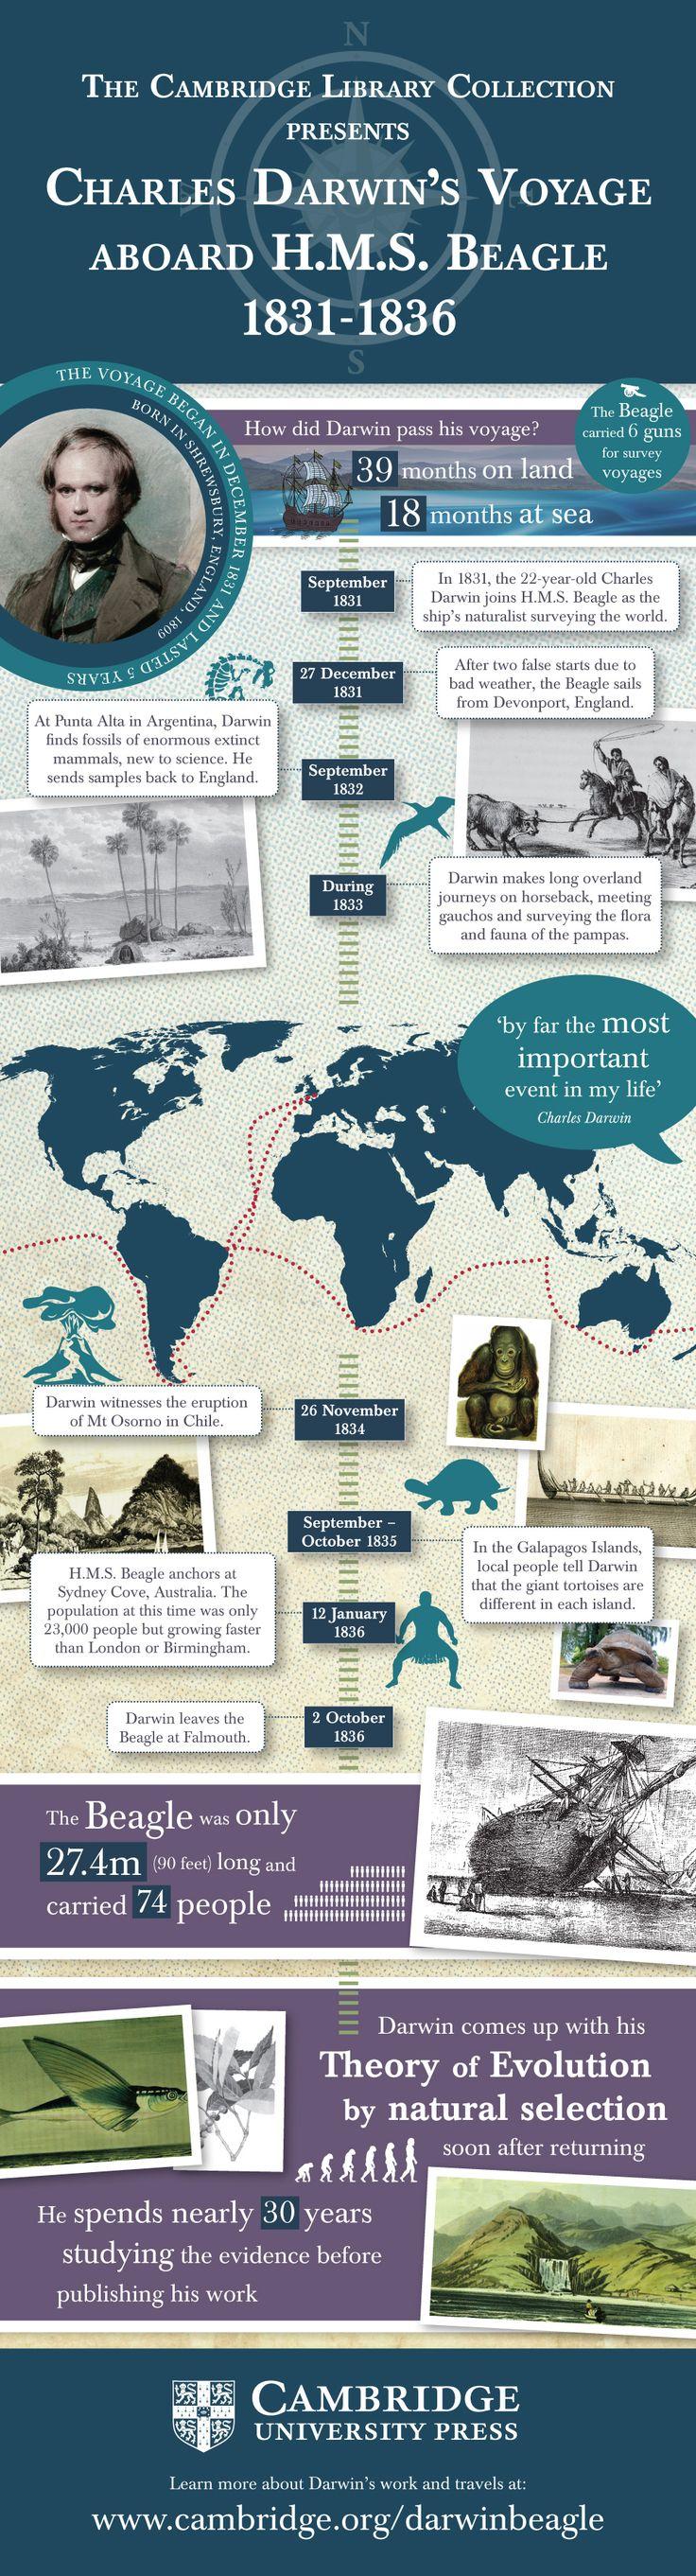 infographic darwin - Recherche Google